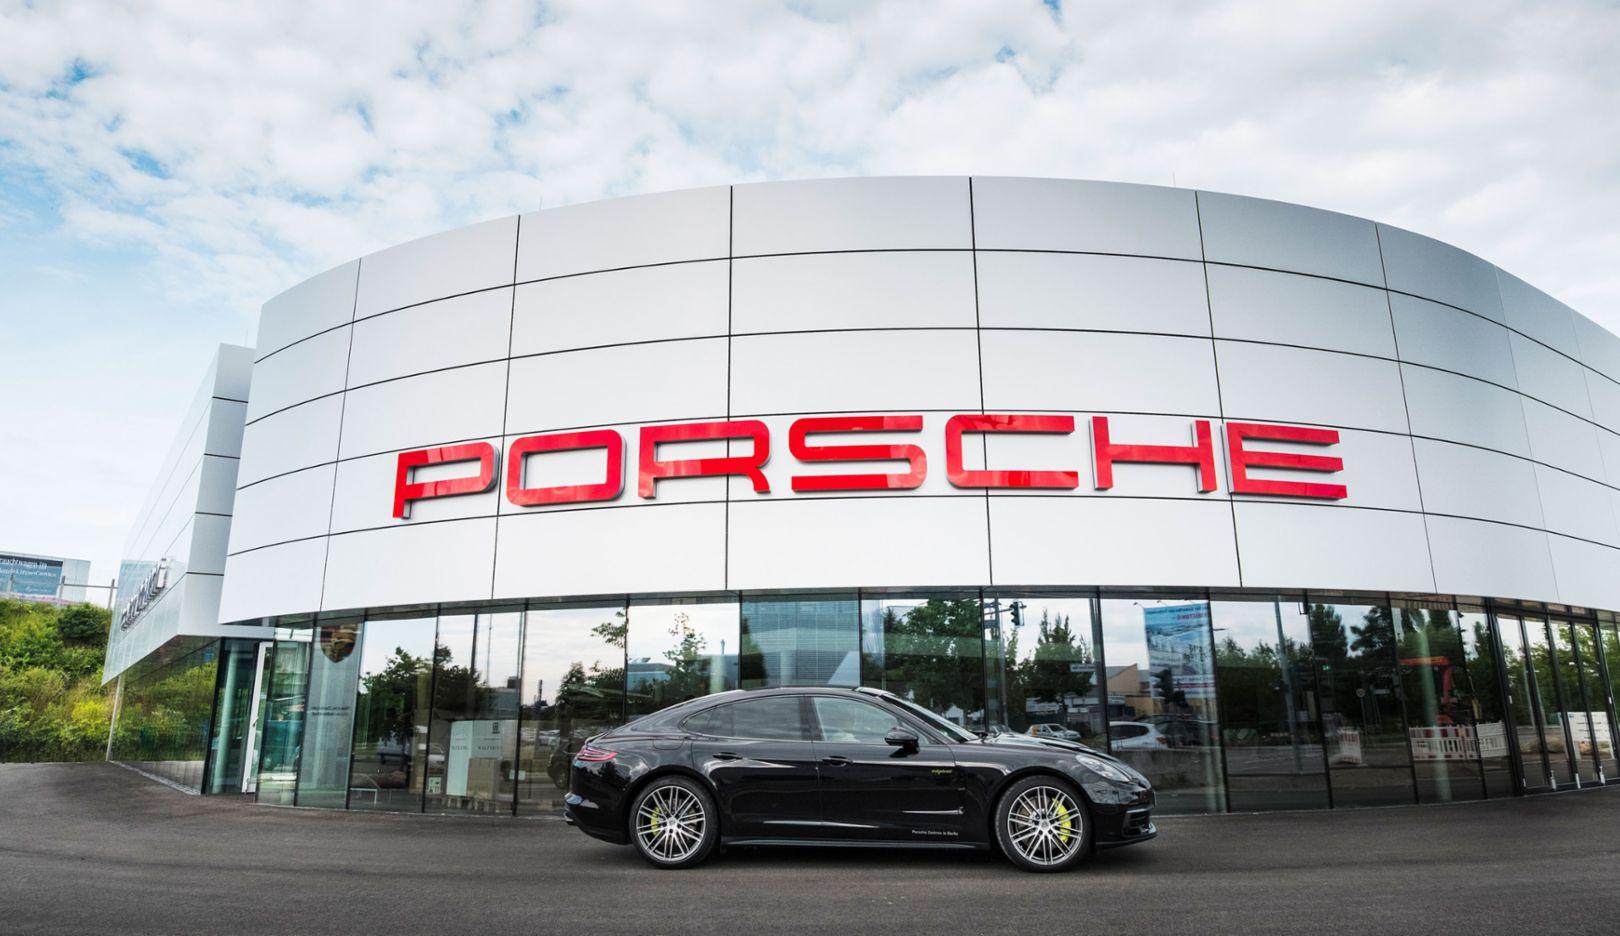 Panamera 4 E-Hybrid, Porsche Zentrum Berlin-Adlershof, 2017, Porsche AG